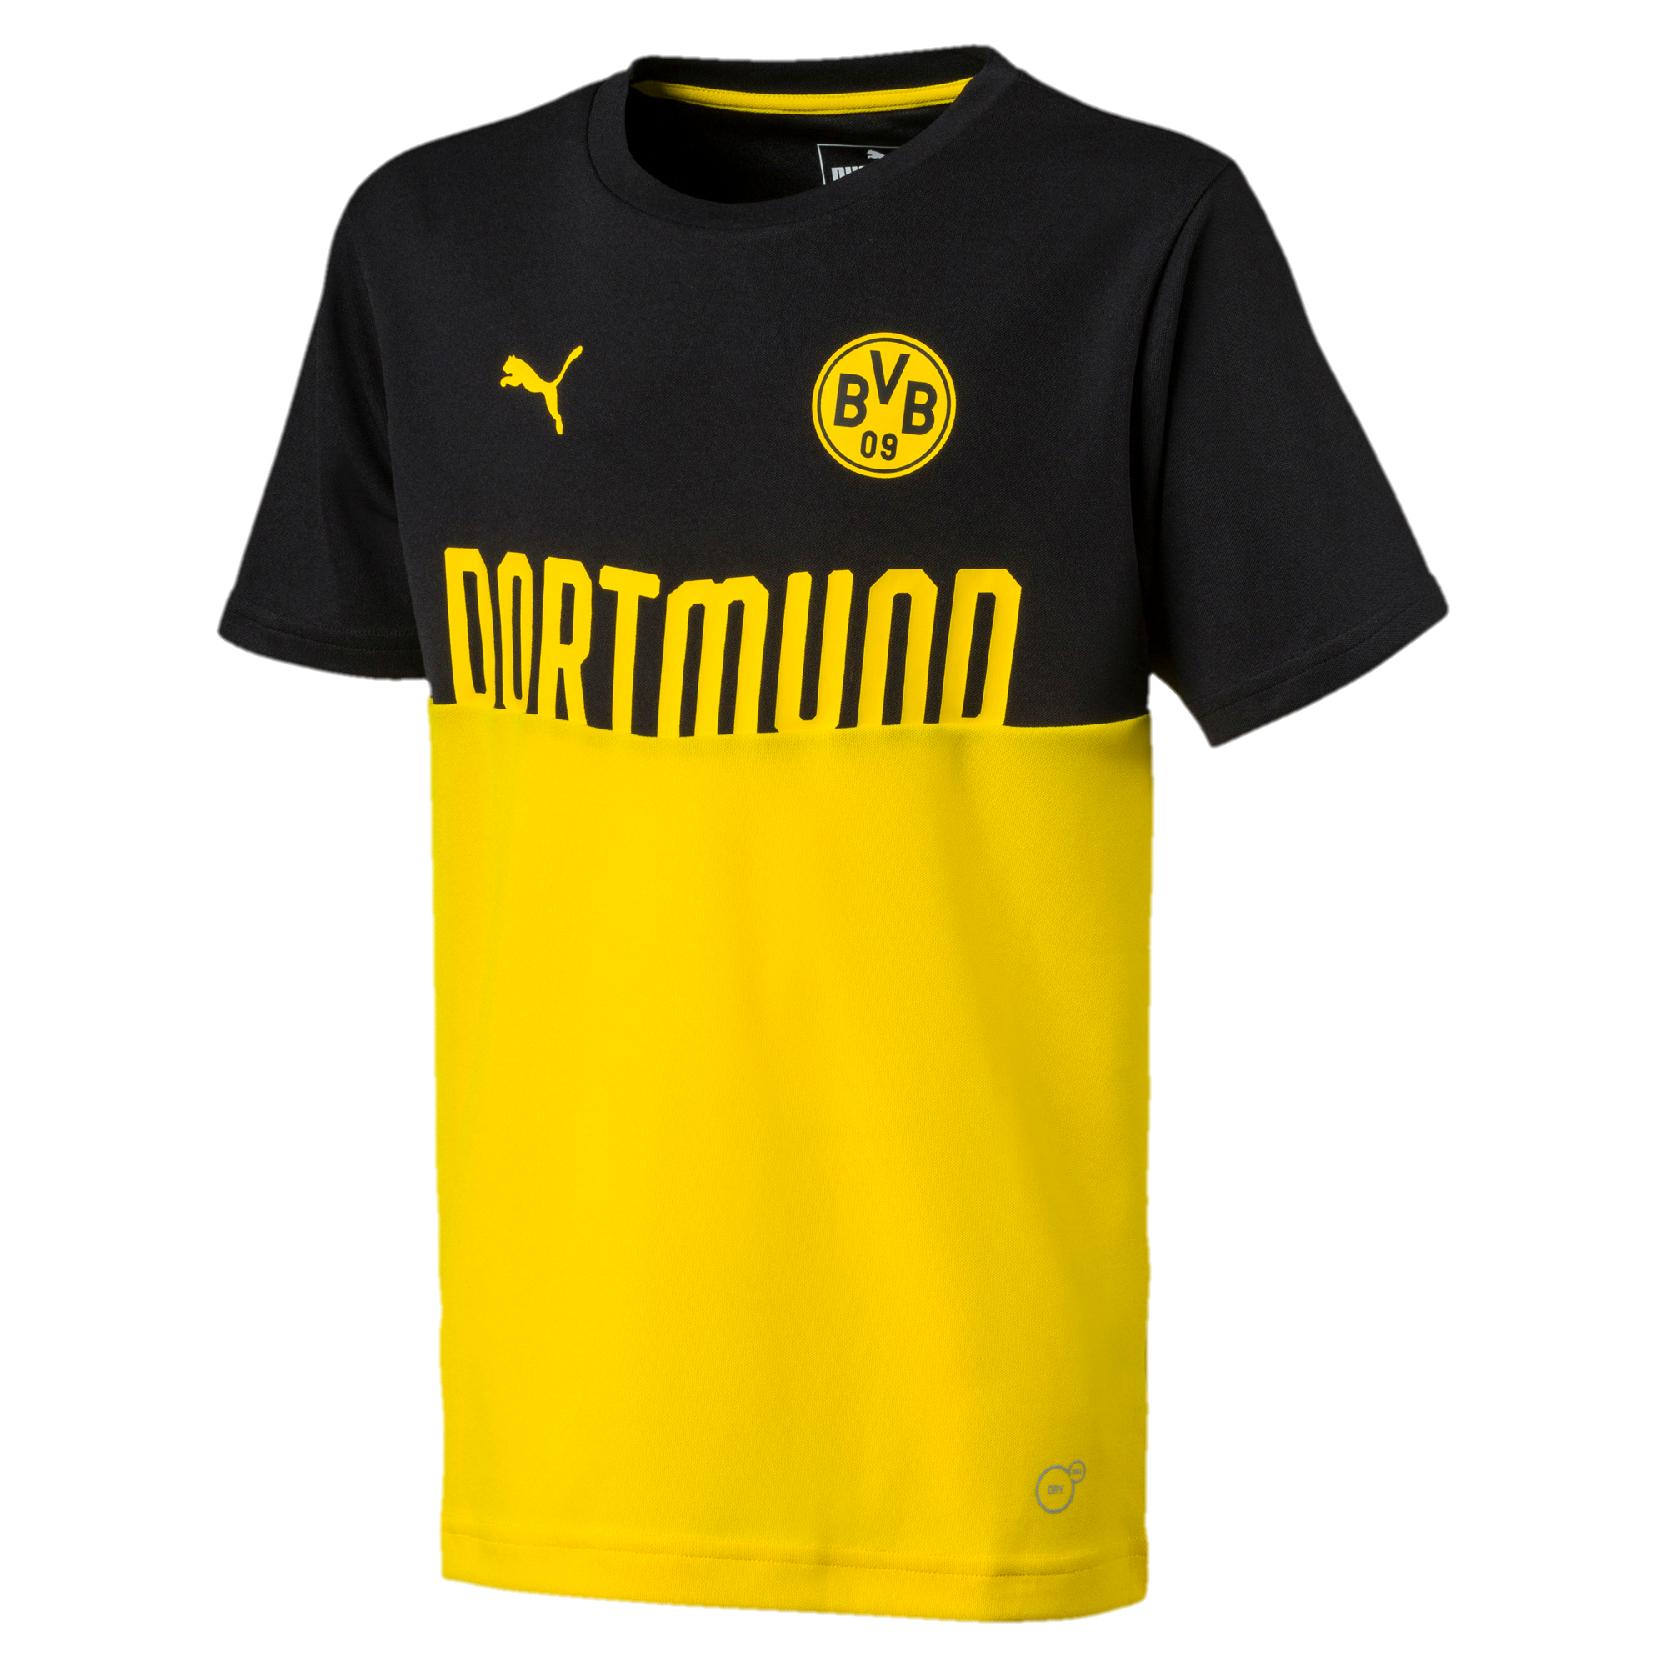 schwrz 2017 2018 Borussia Dortmund Training Shirt